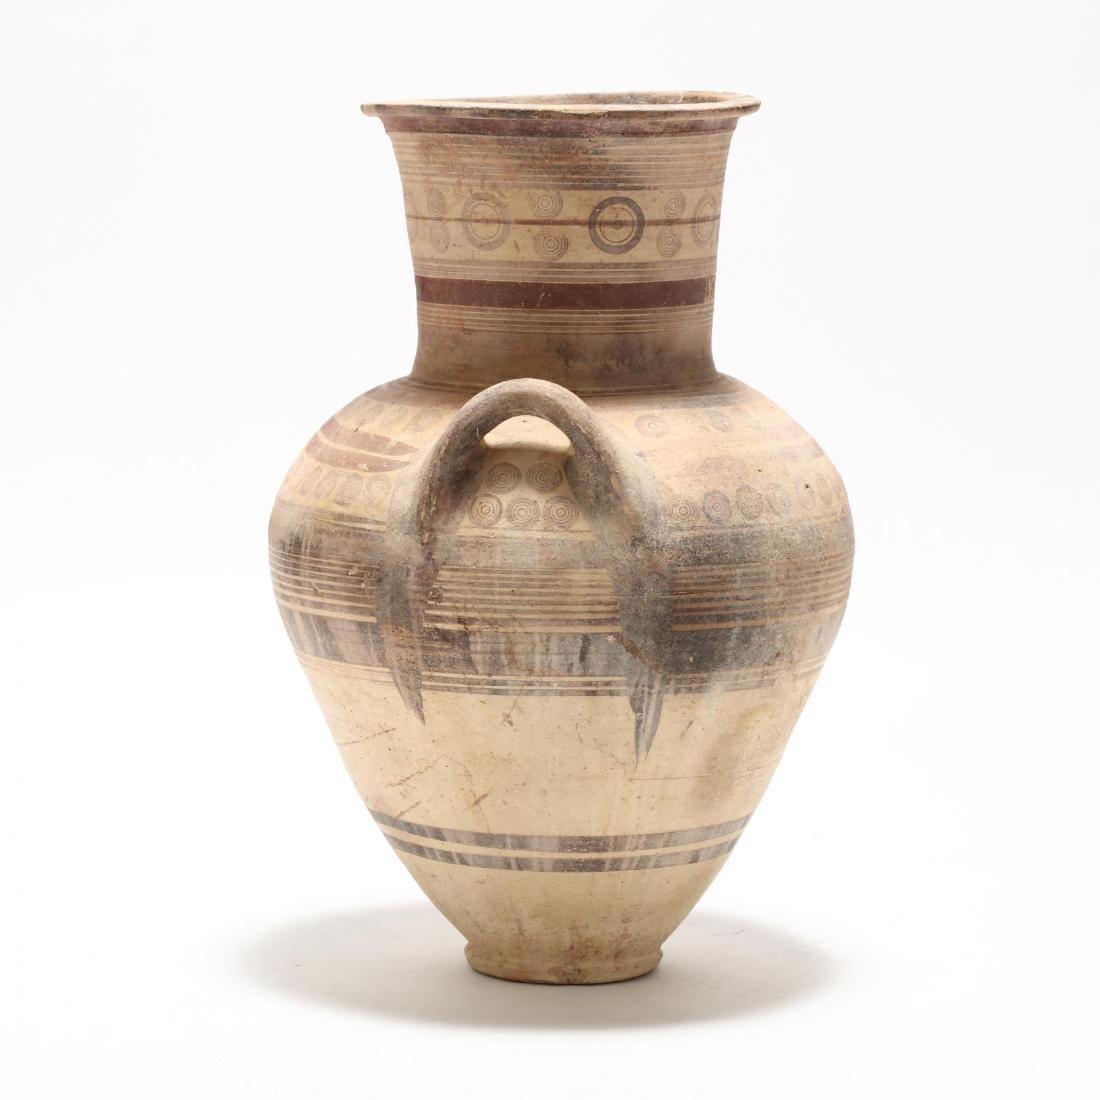 Large Cypro-Archaic Bichrome Amphora - 4